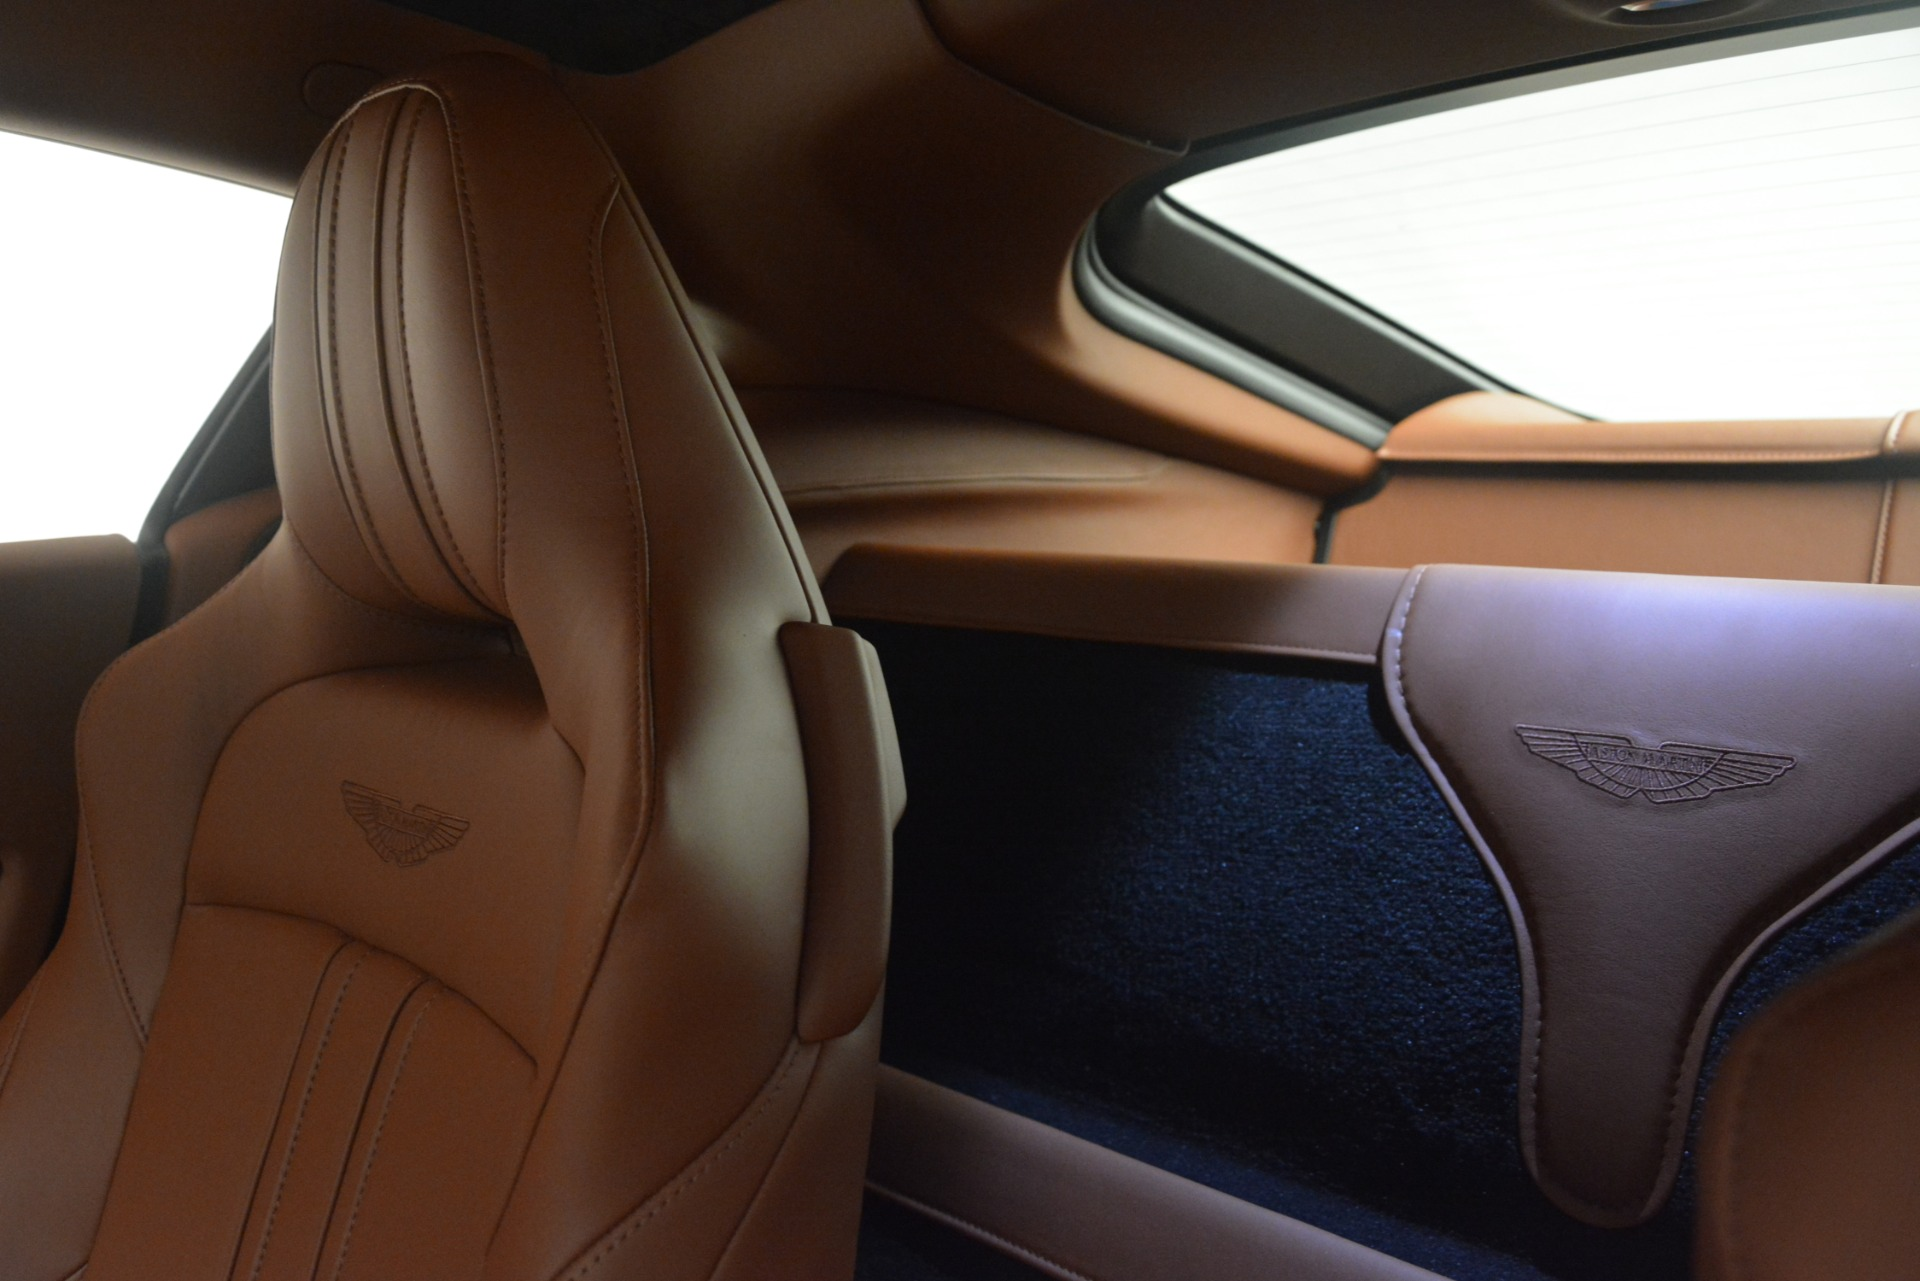 New 2019 Aston Martin Vantage Coupe For Sale In Greenwich, CT. Alfa Romeo of Greenwich, A1373 3227_p17